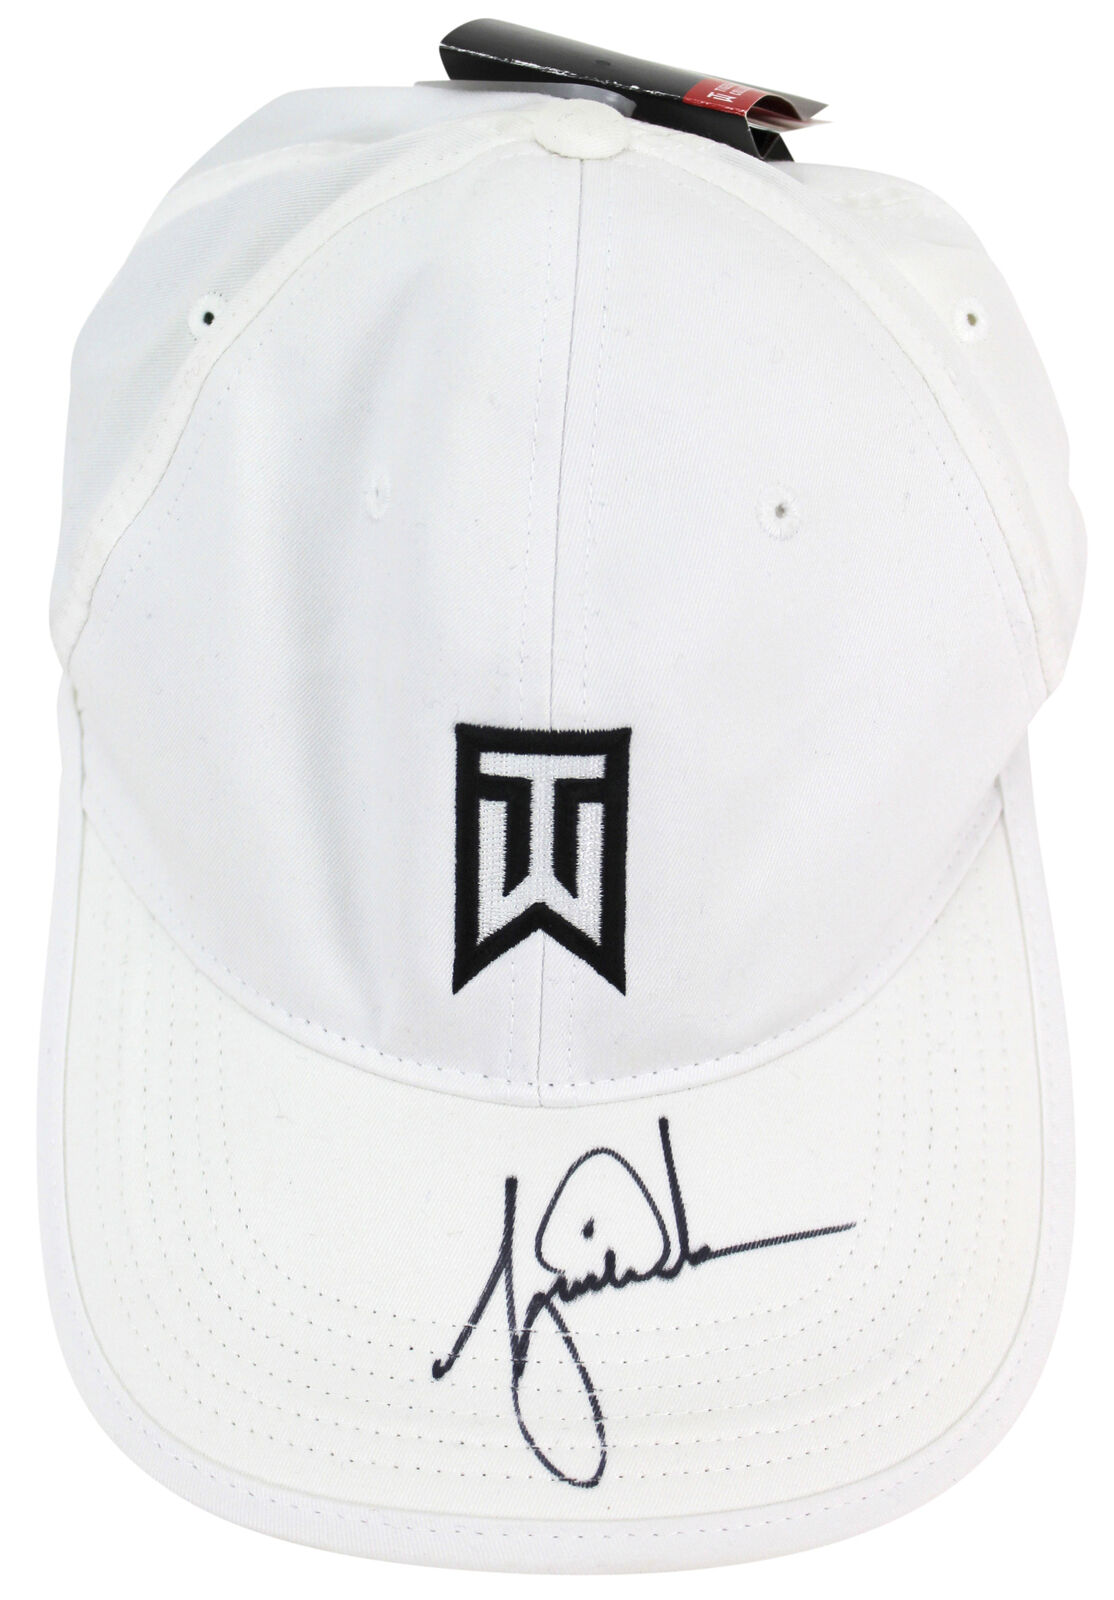 6137b774 Lot Detail - Tiger Woods Signed Personal Model Golf Hat (Beckett/BAS)